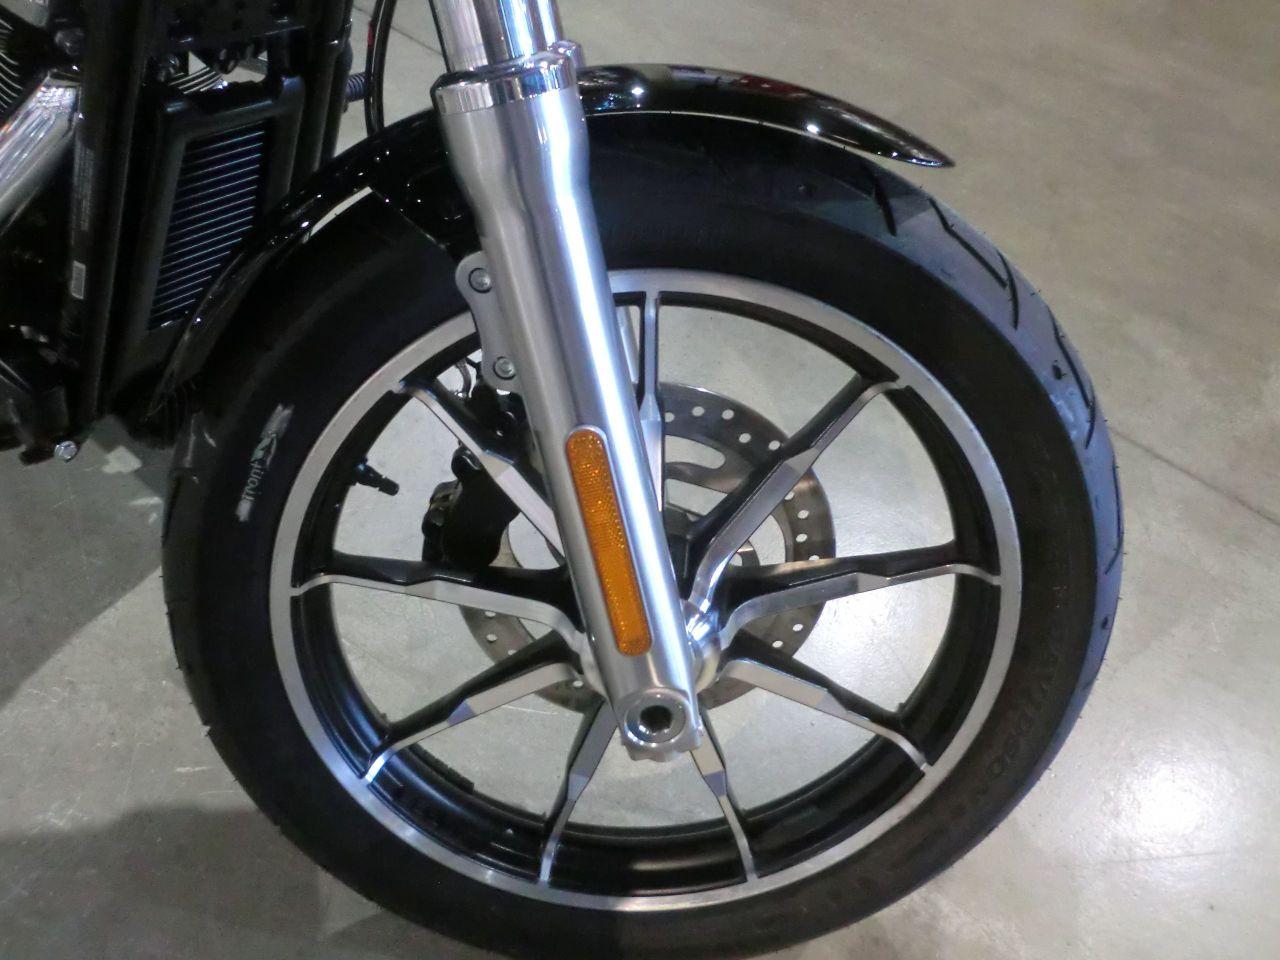 2019 Harley-Davidson FXR